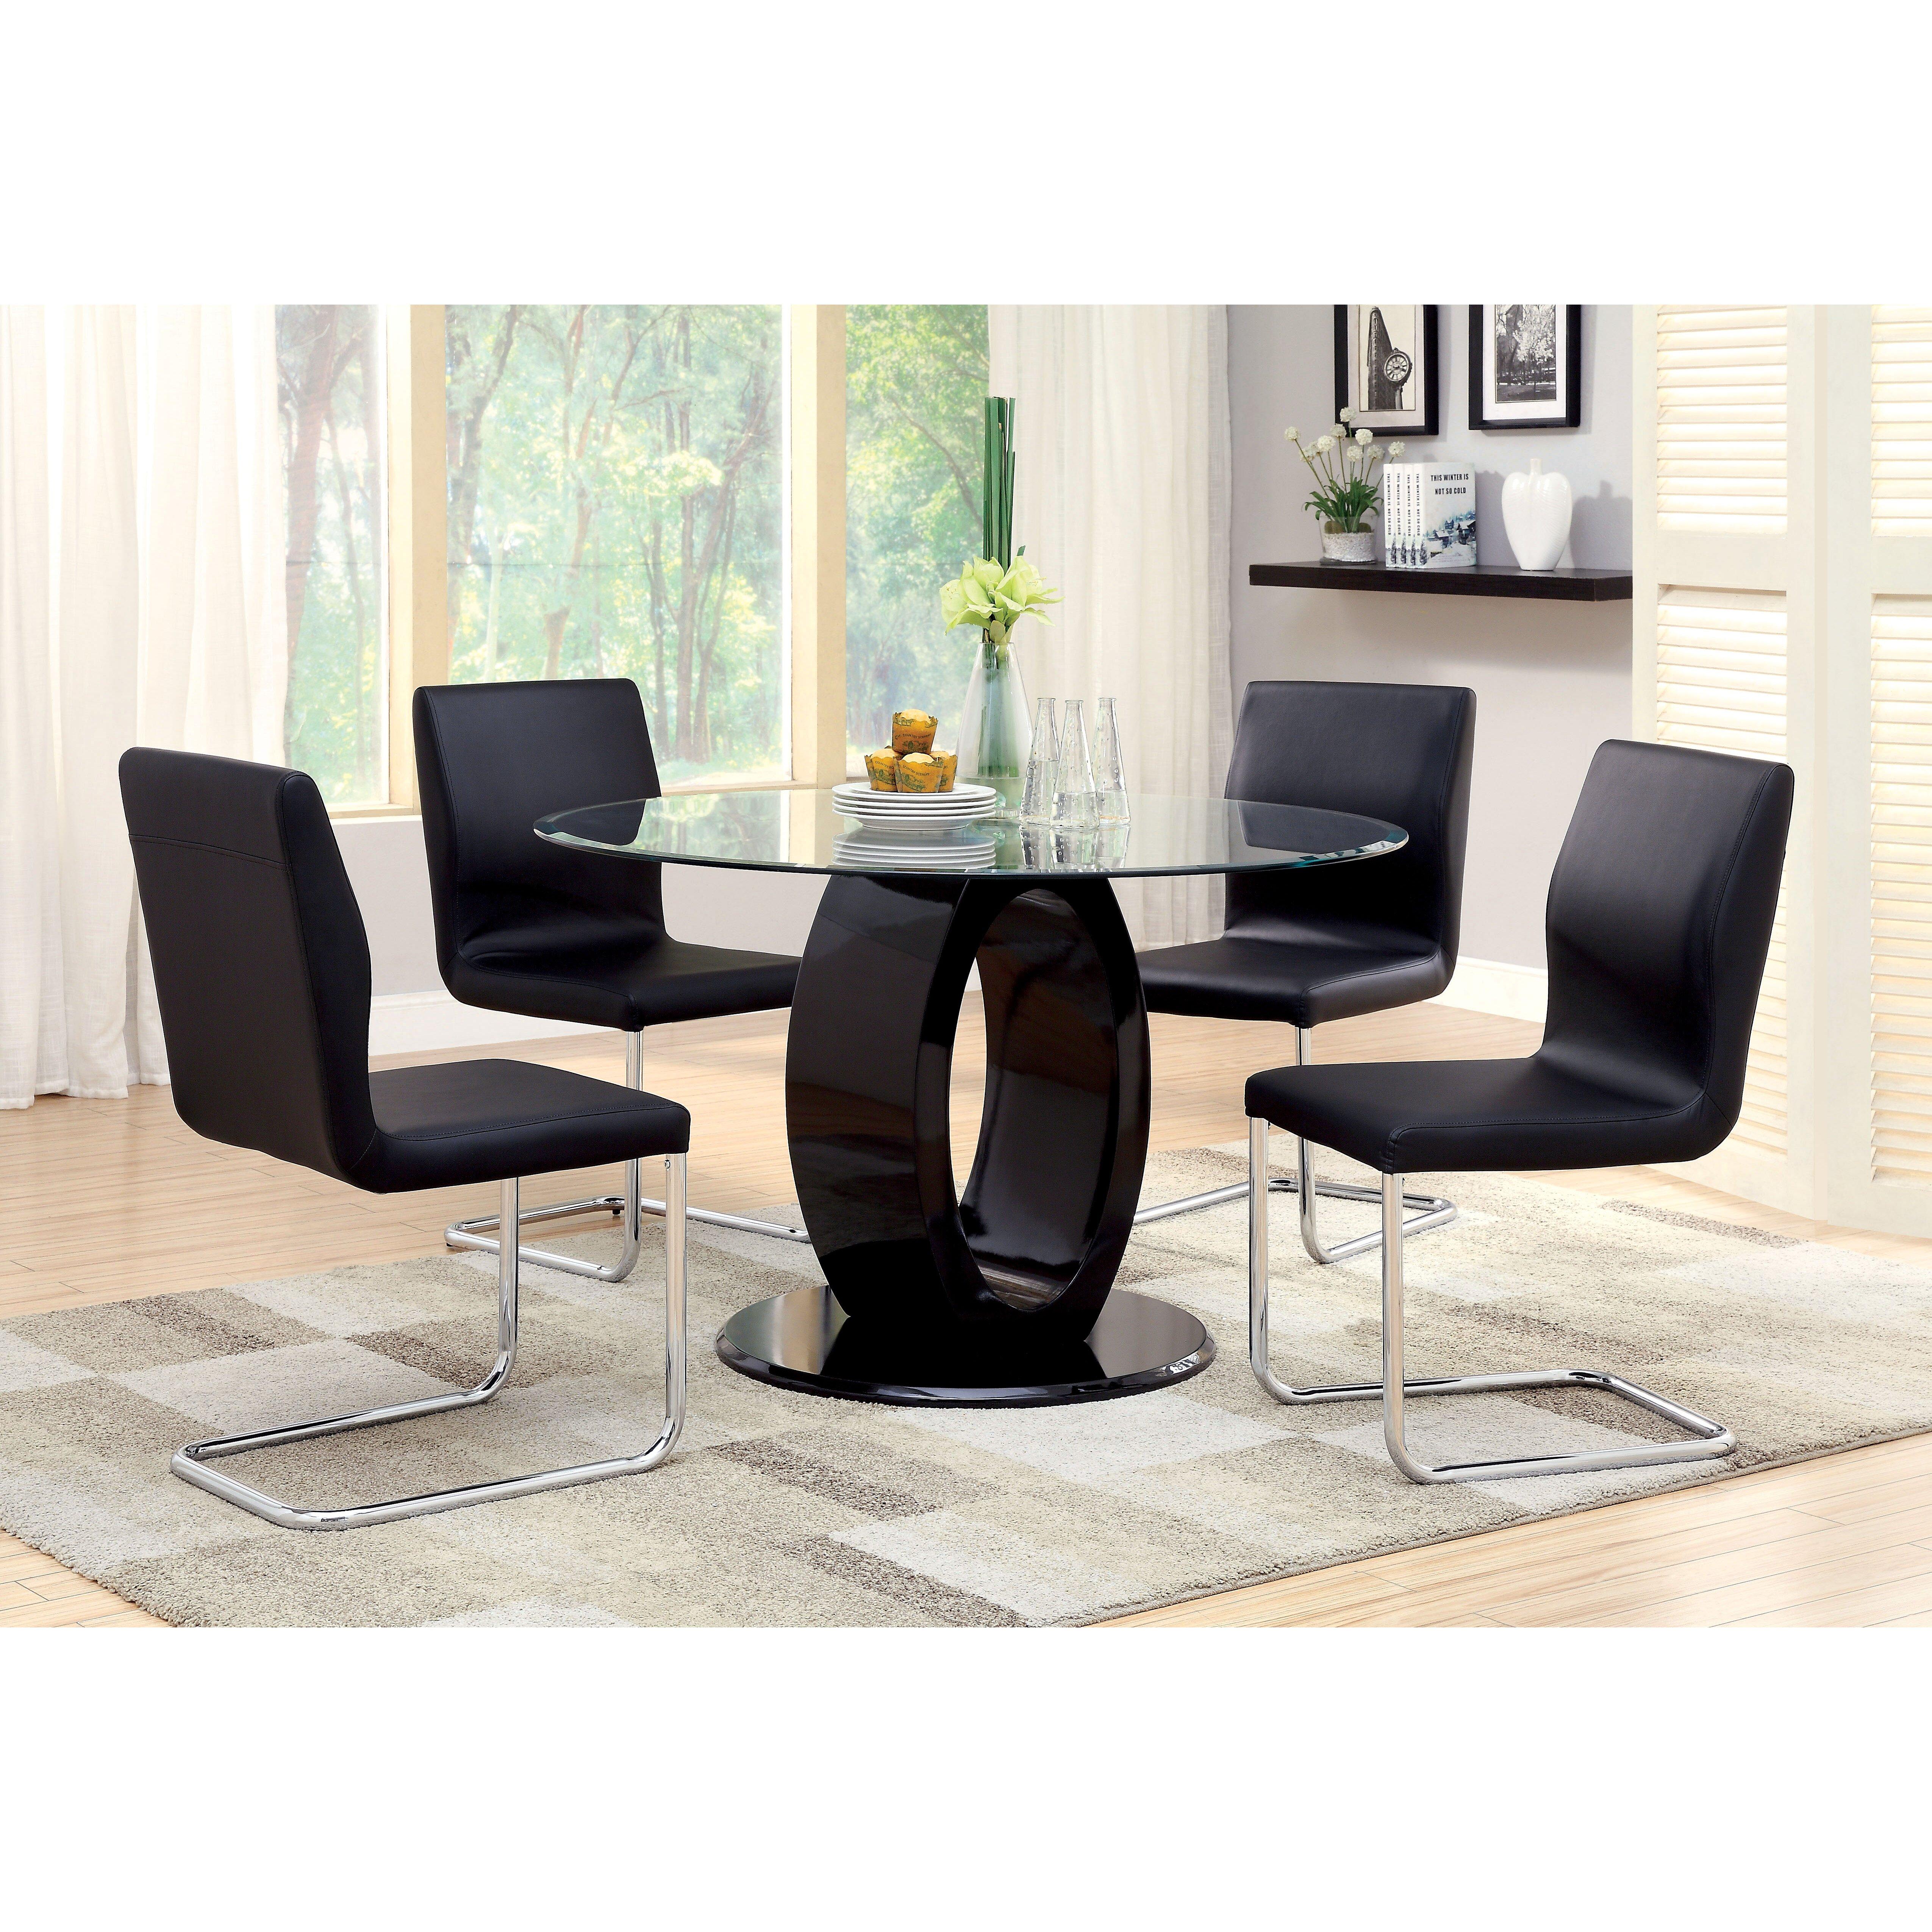 Hokku designs benedict dining table reviews wayfair for Hokku designs dining room furniture